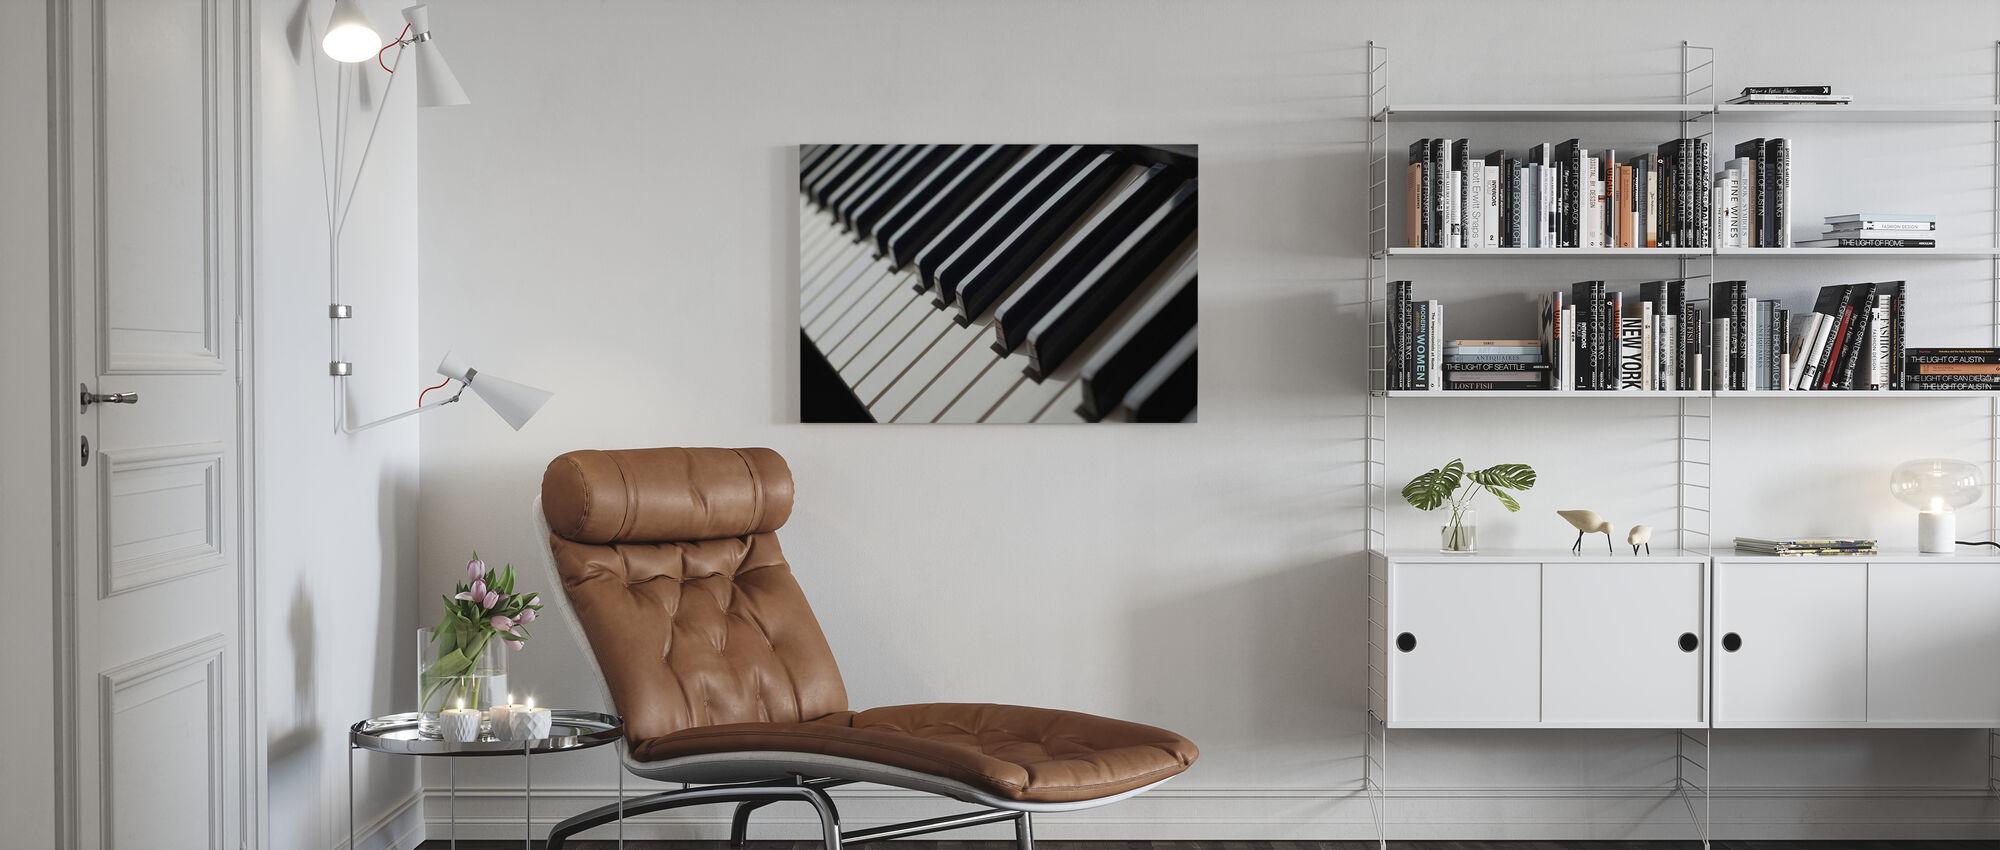 Piano Keyboard - Canvas print - Living Room